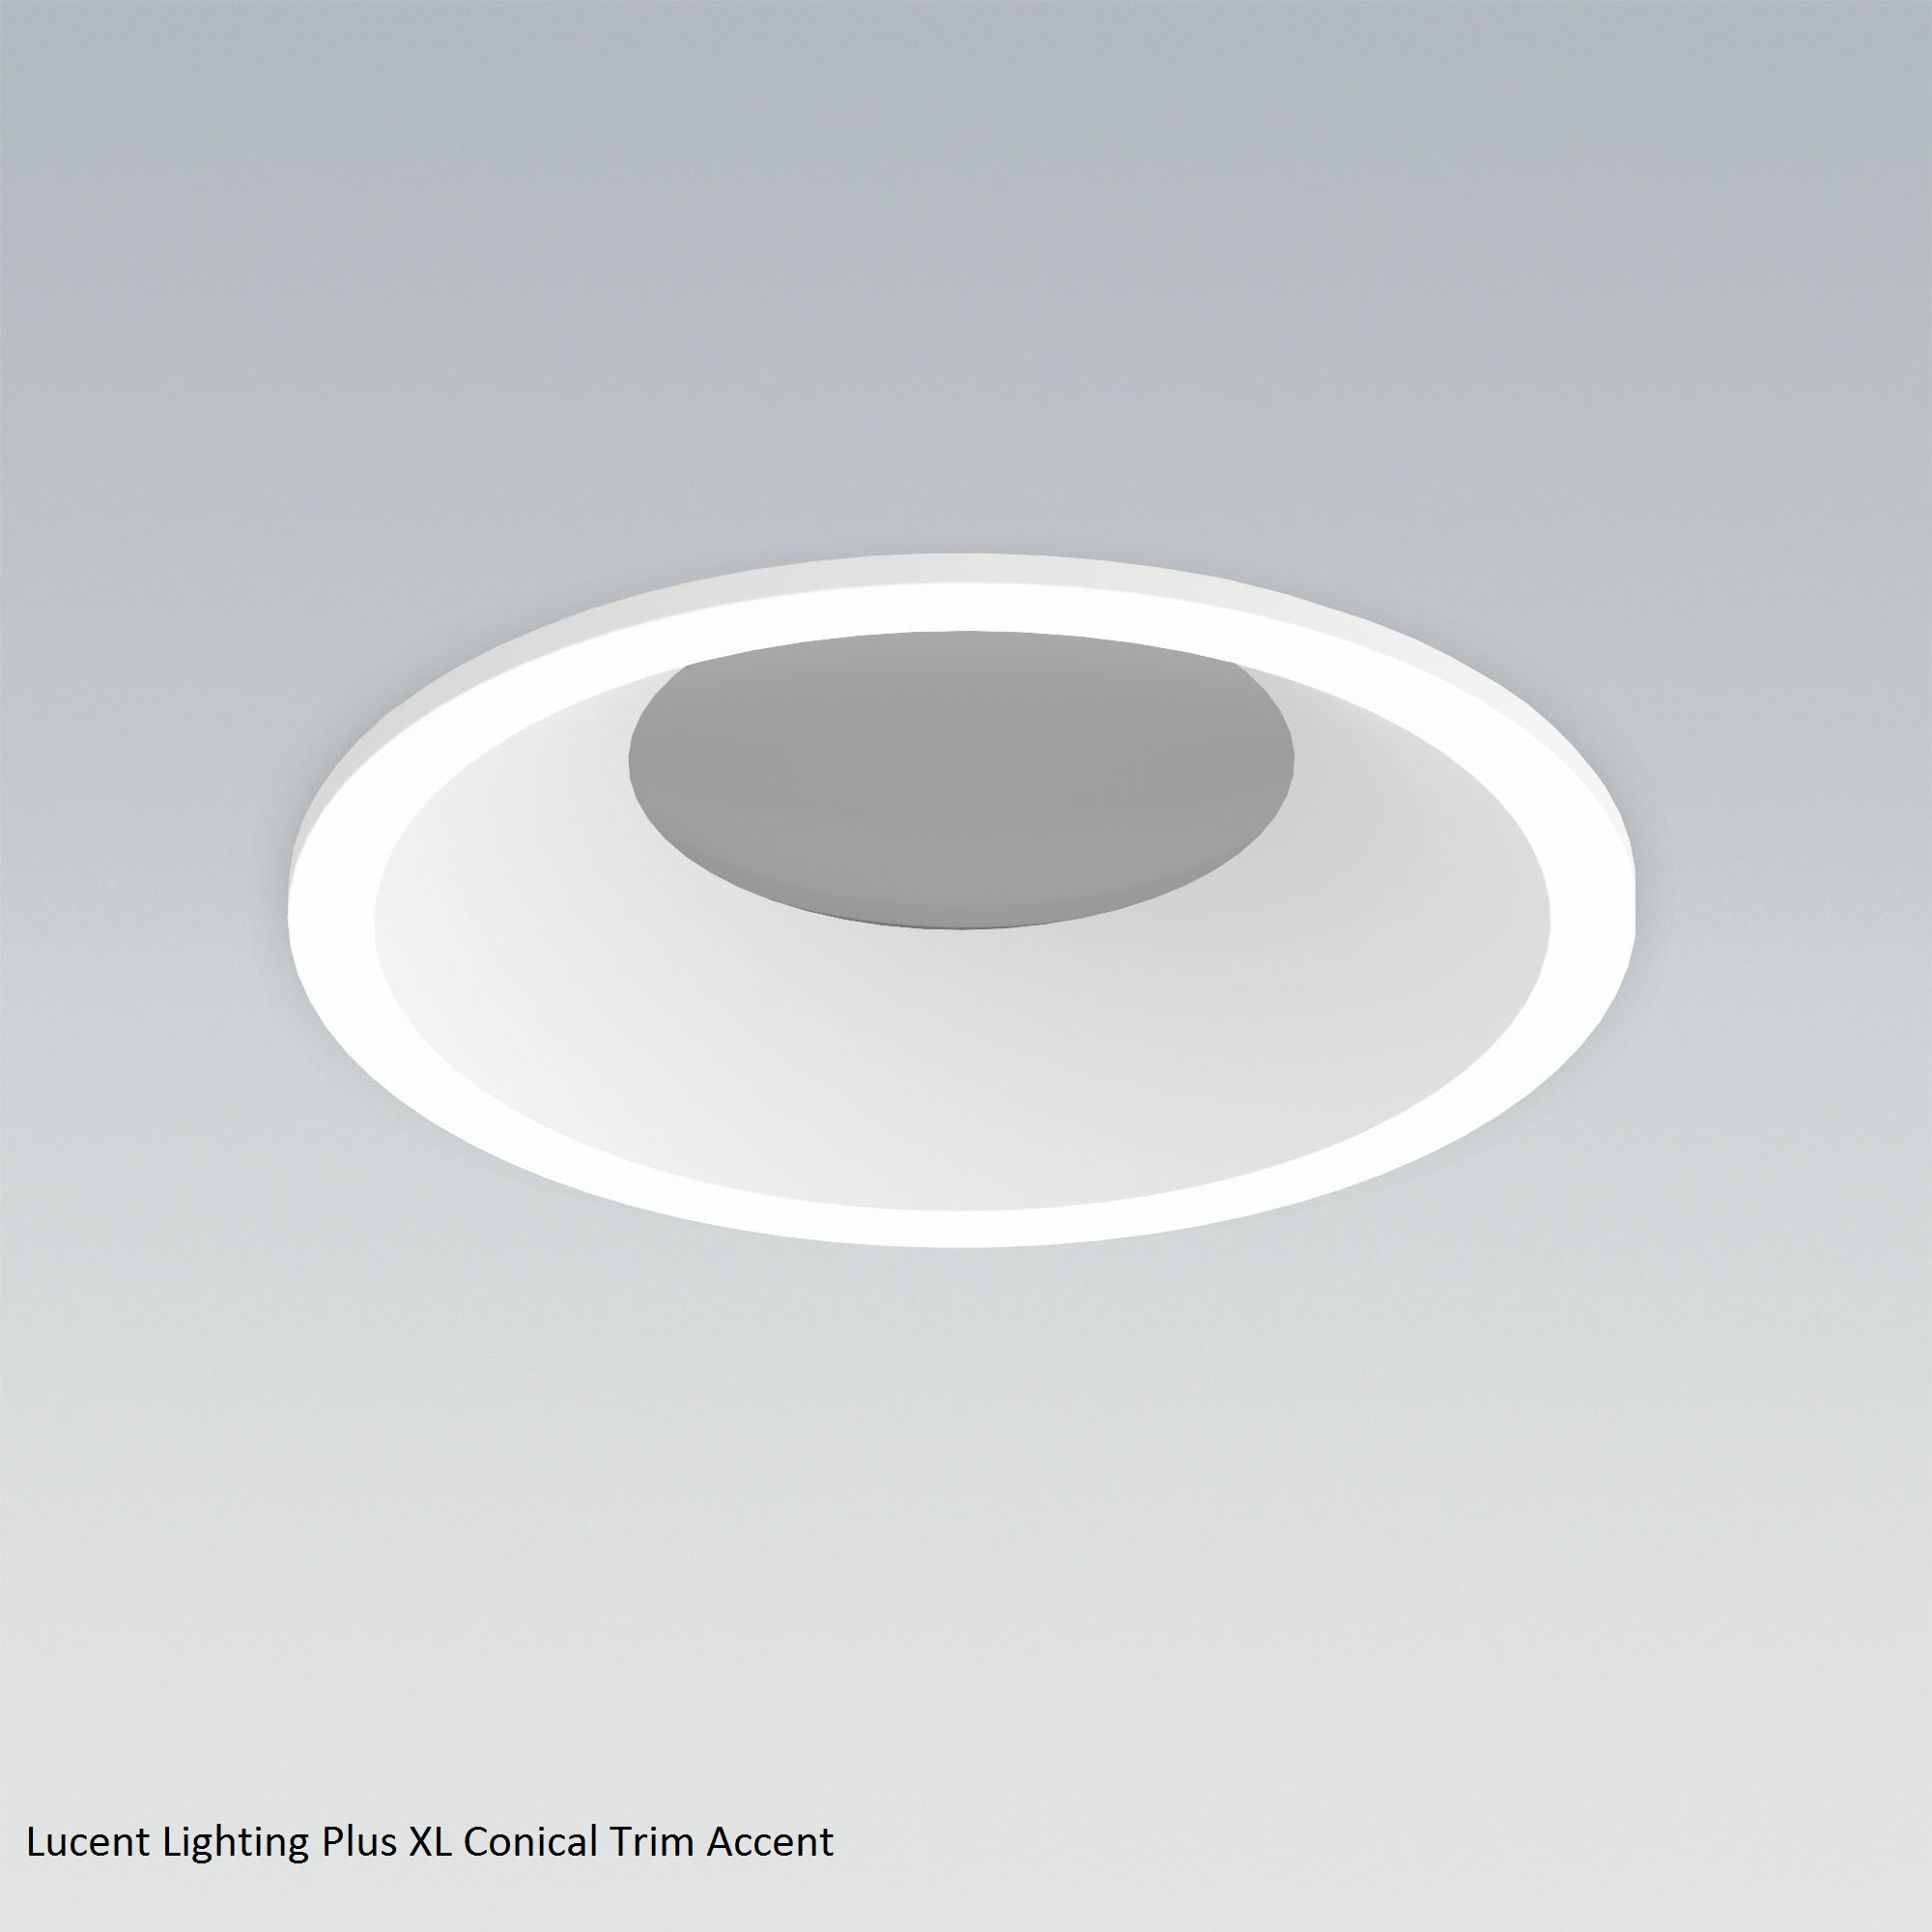 lucent-lighting-plus-xl-conical-trim-accent